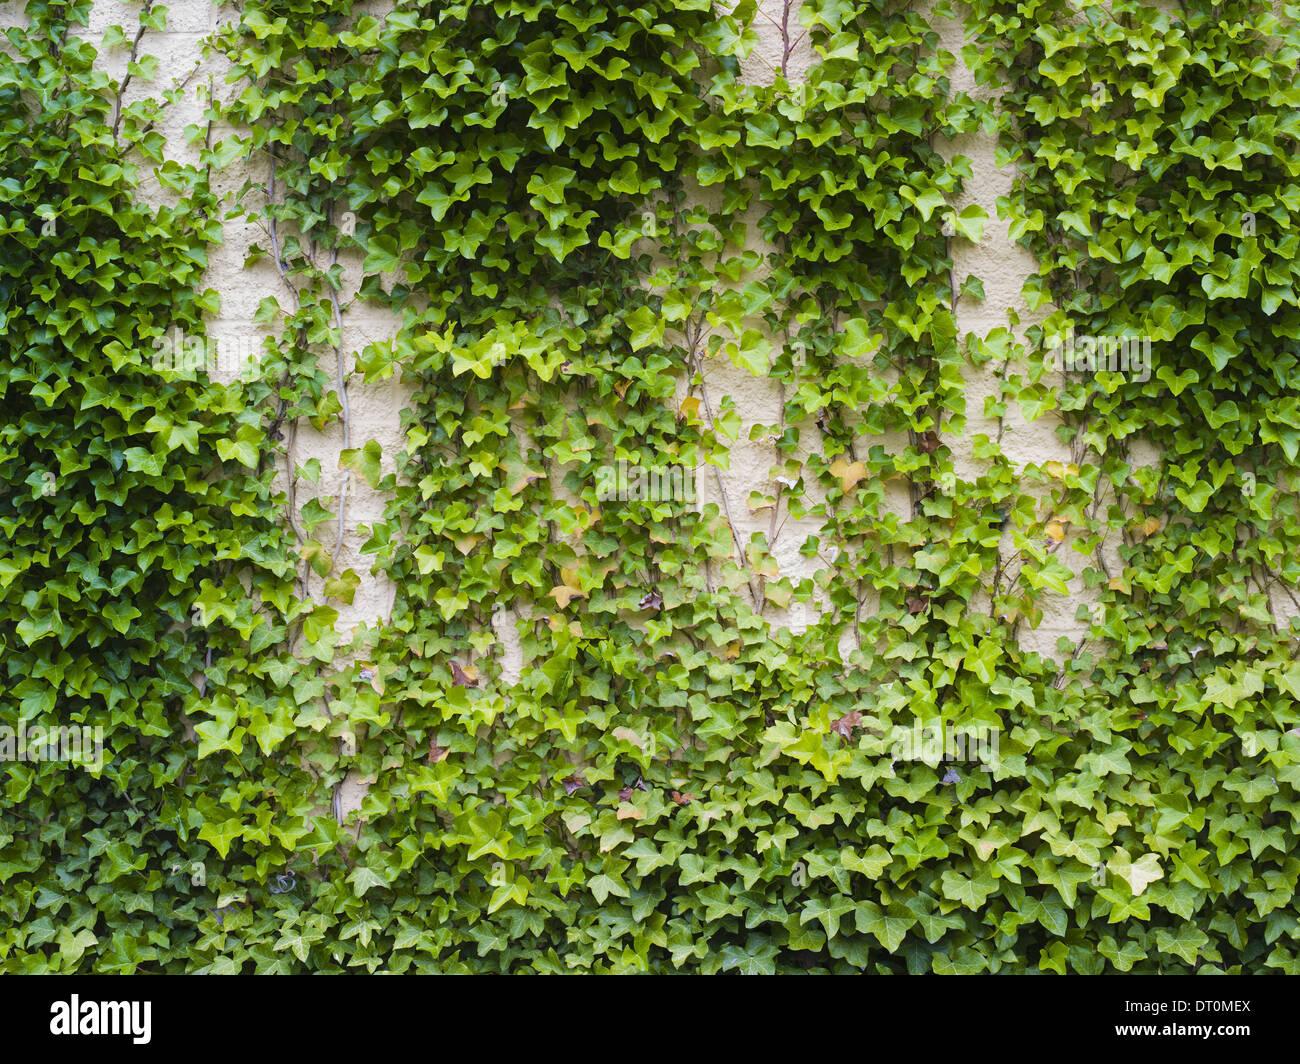 Washington USA Ivy growing lush plant on brick wall - Stock Image